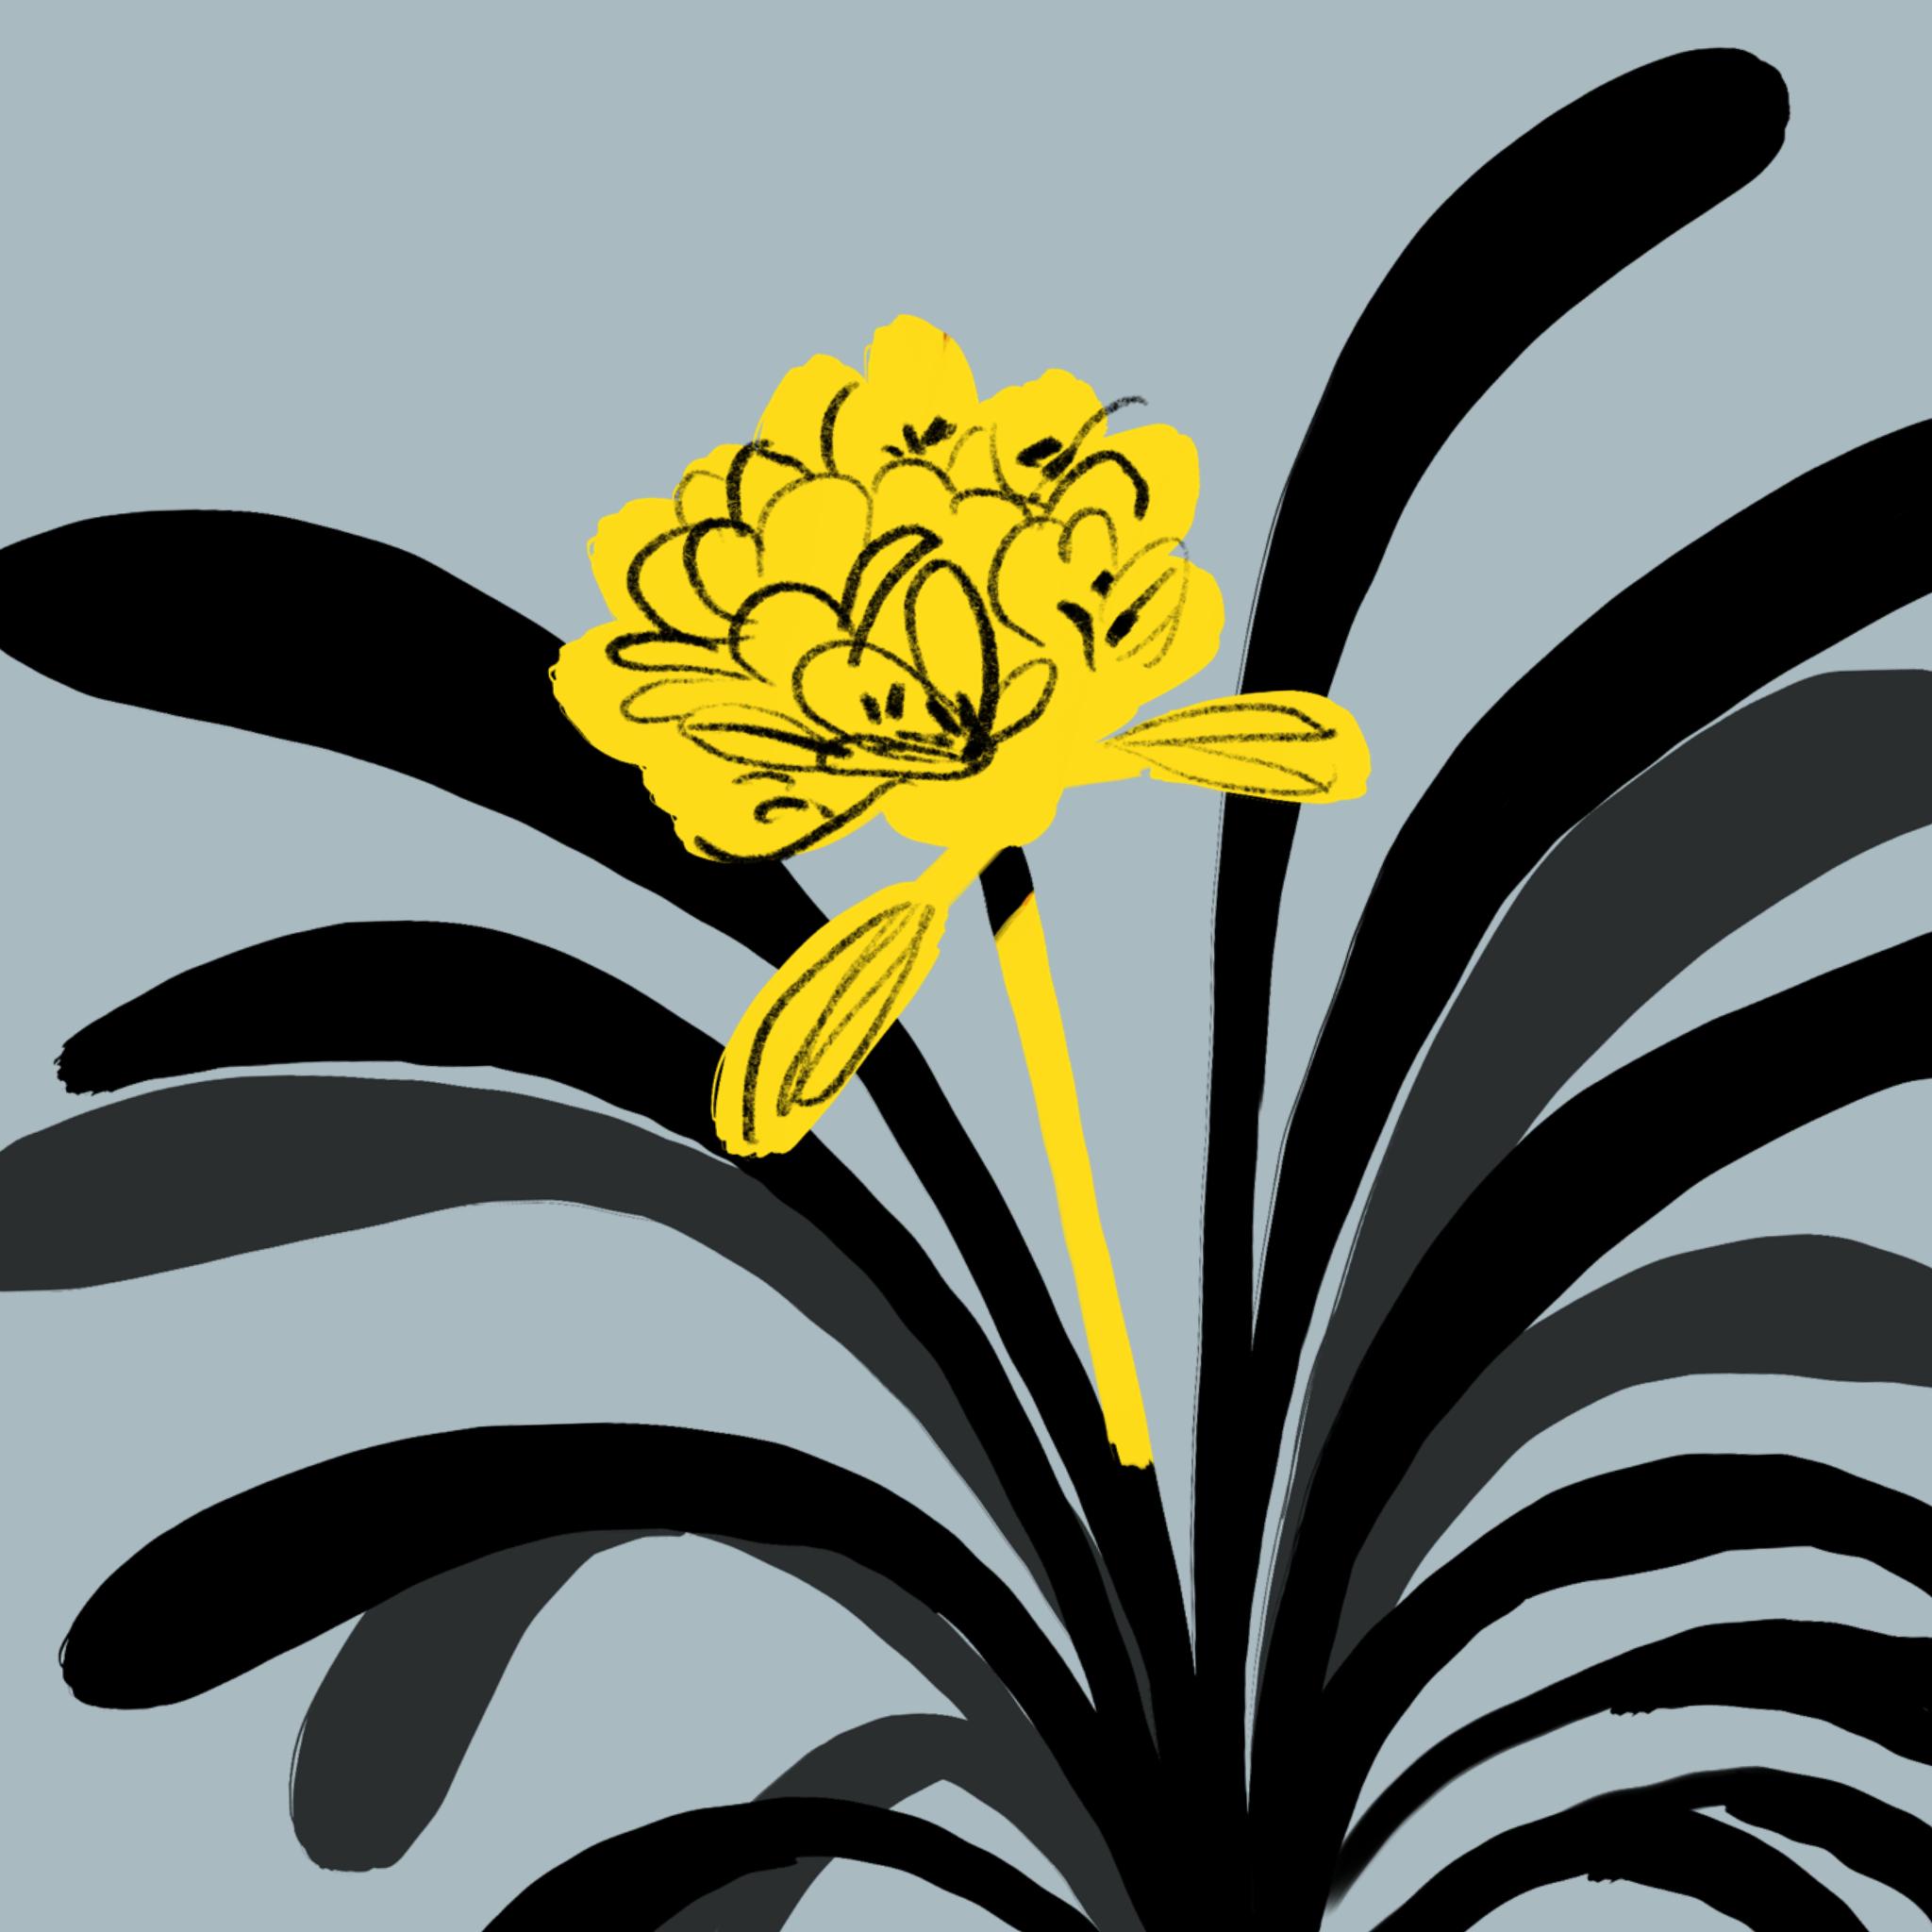 Yellow rough flower by Silvana Mariani